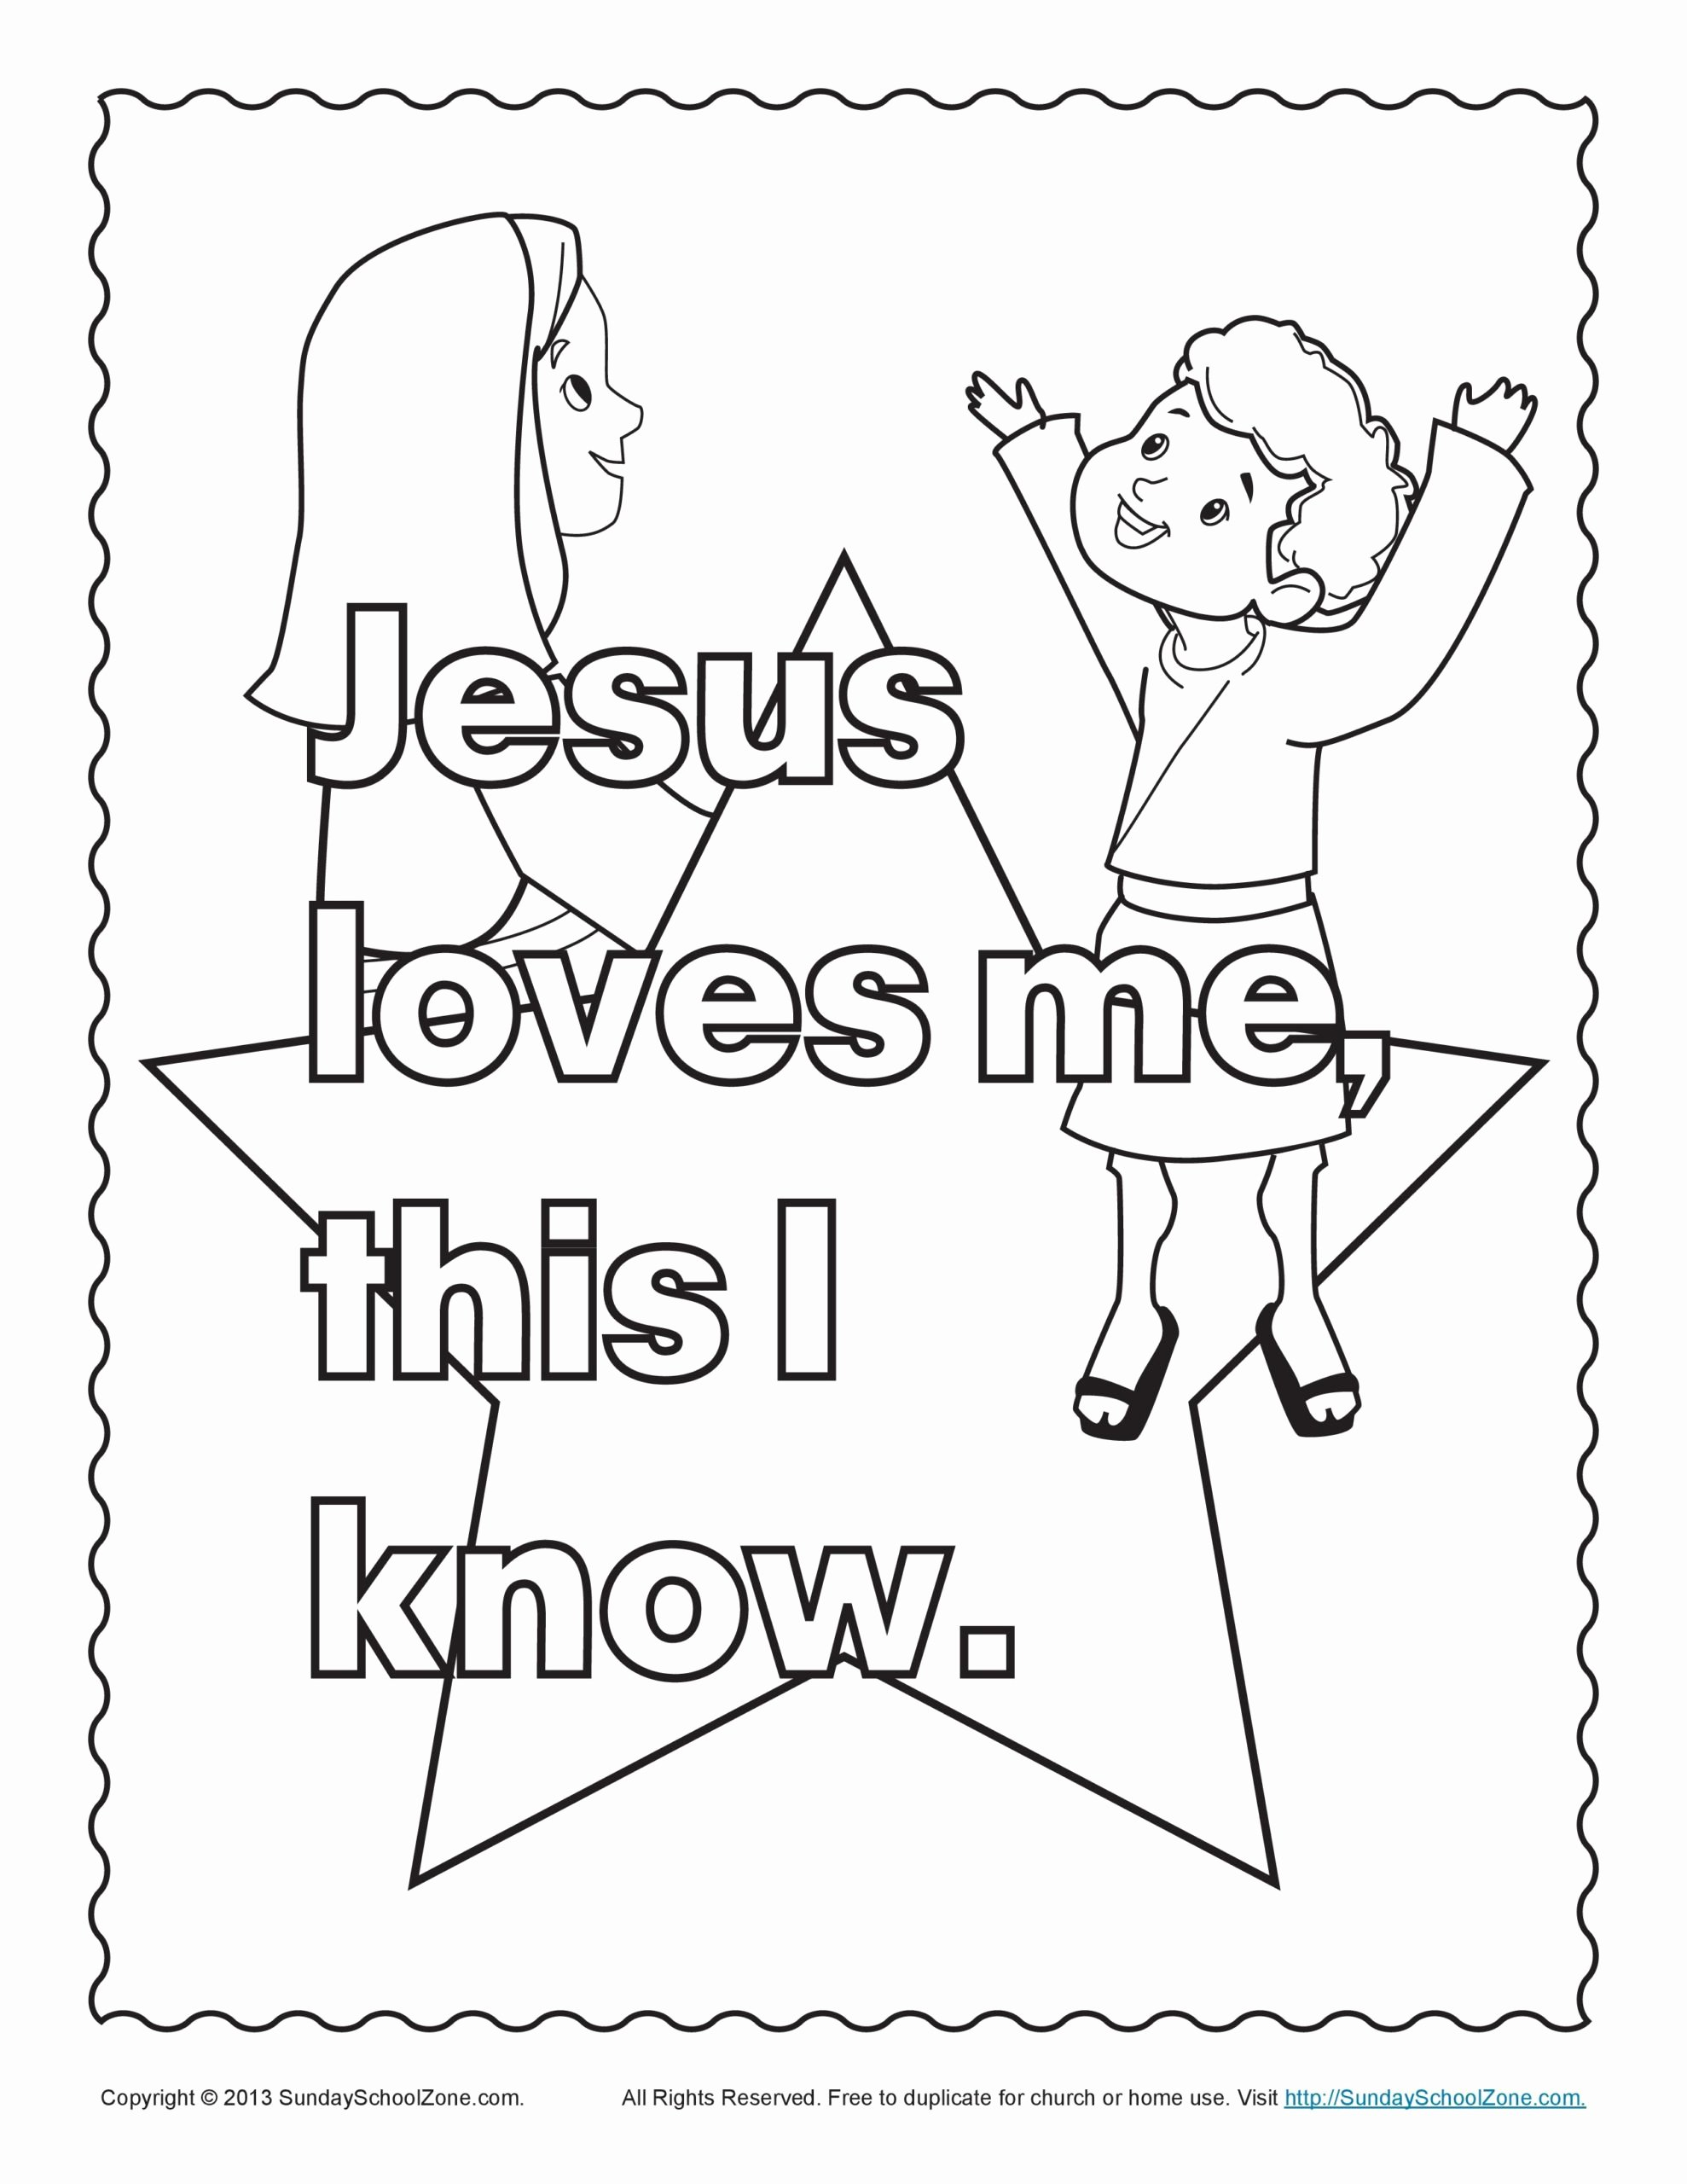 Friendship Worksheets for Preschoolers Unique Coloring Book Free Printable Bible Children Friendship